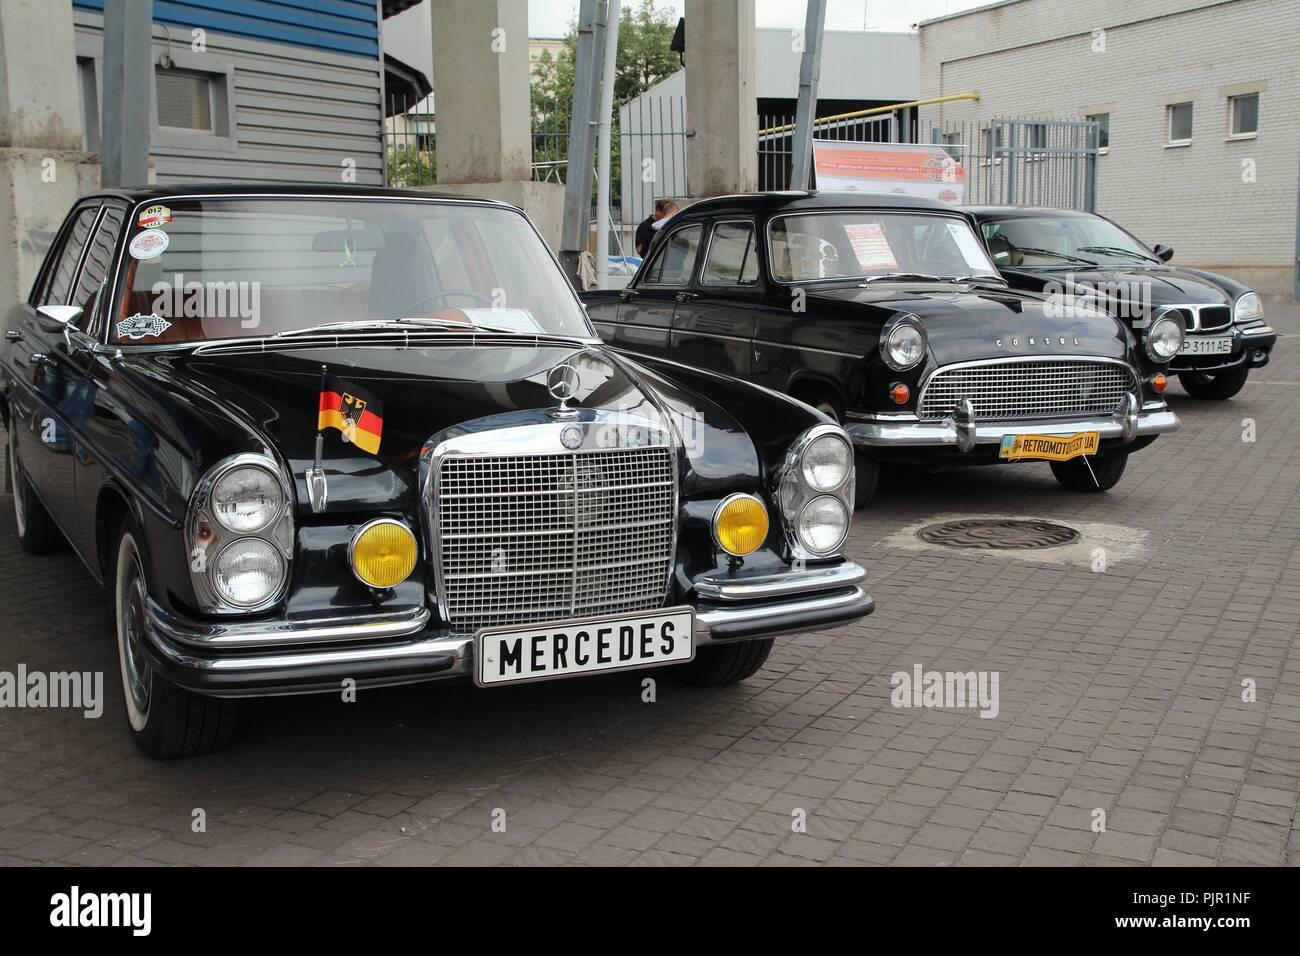 Retromotorfest, Vintage car festival. Stock Photo